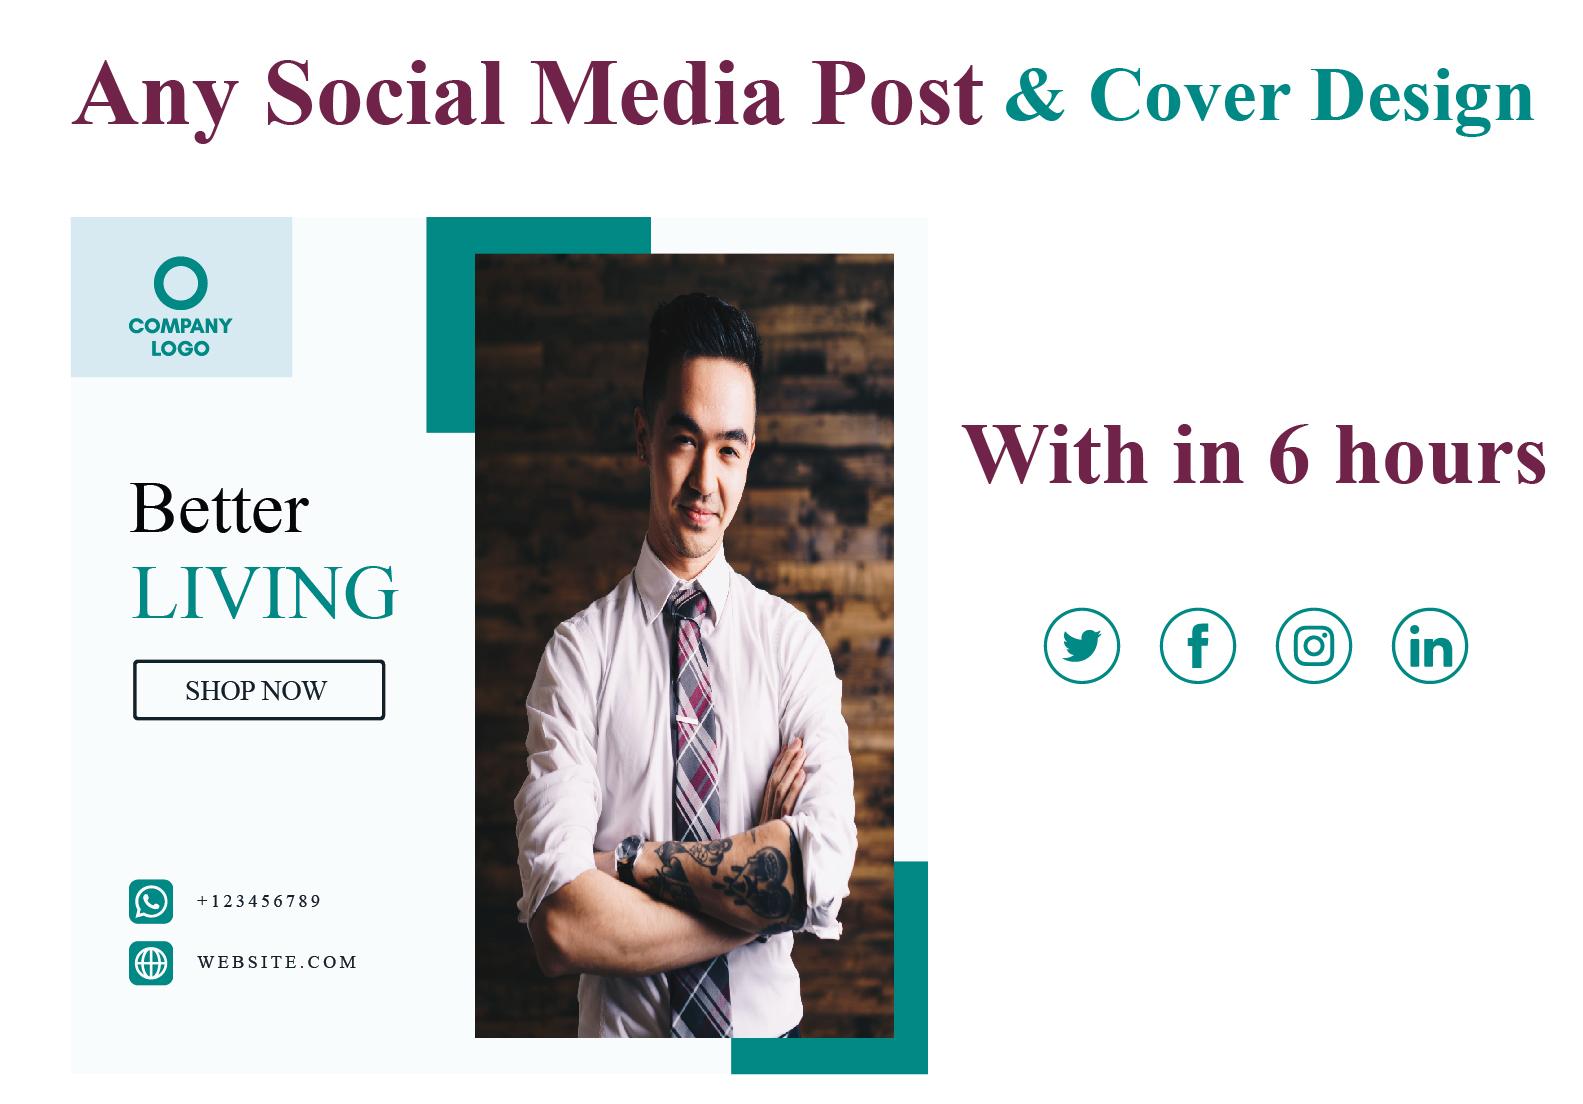 I will professionally design any social media post & cover design